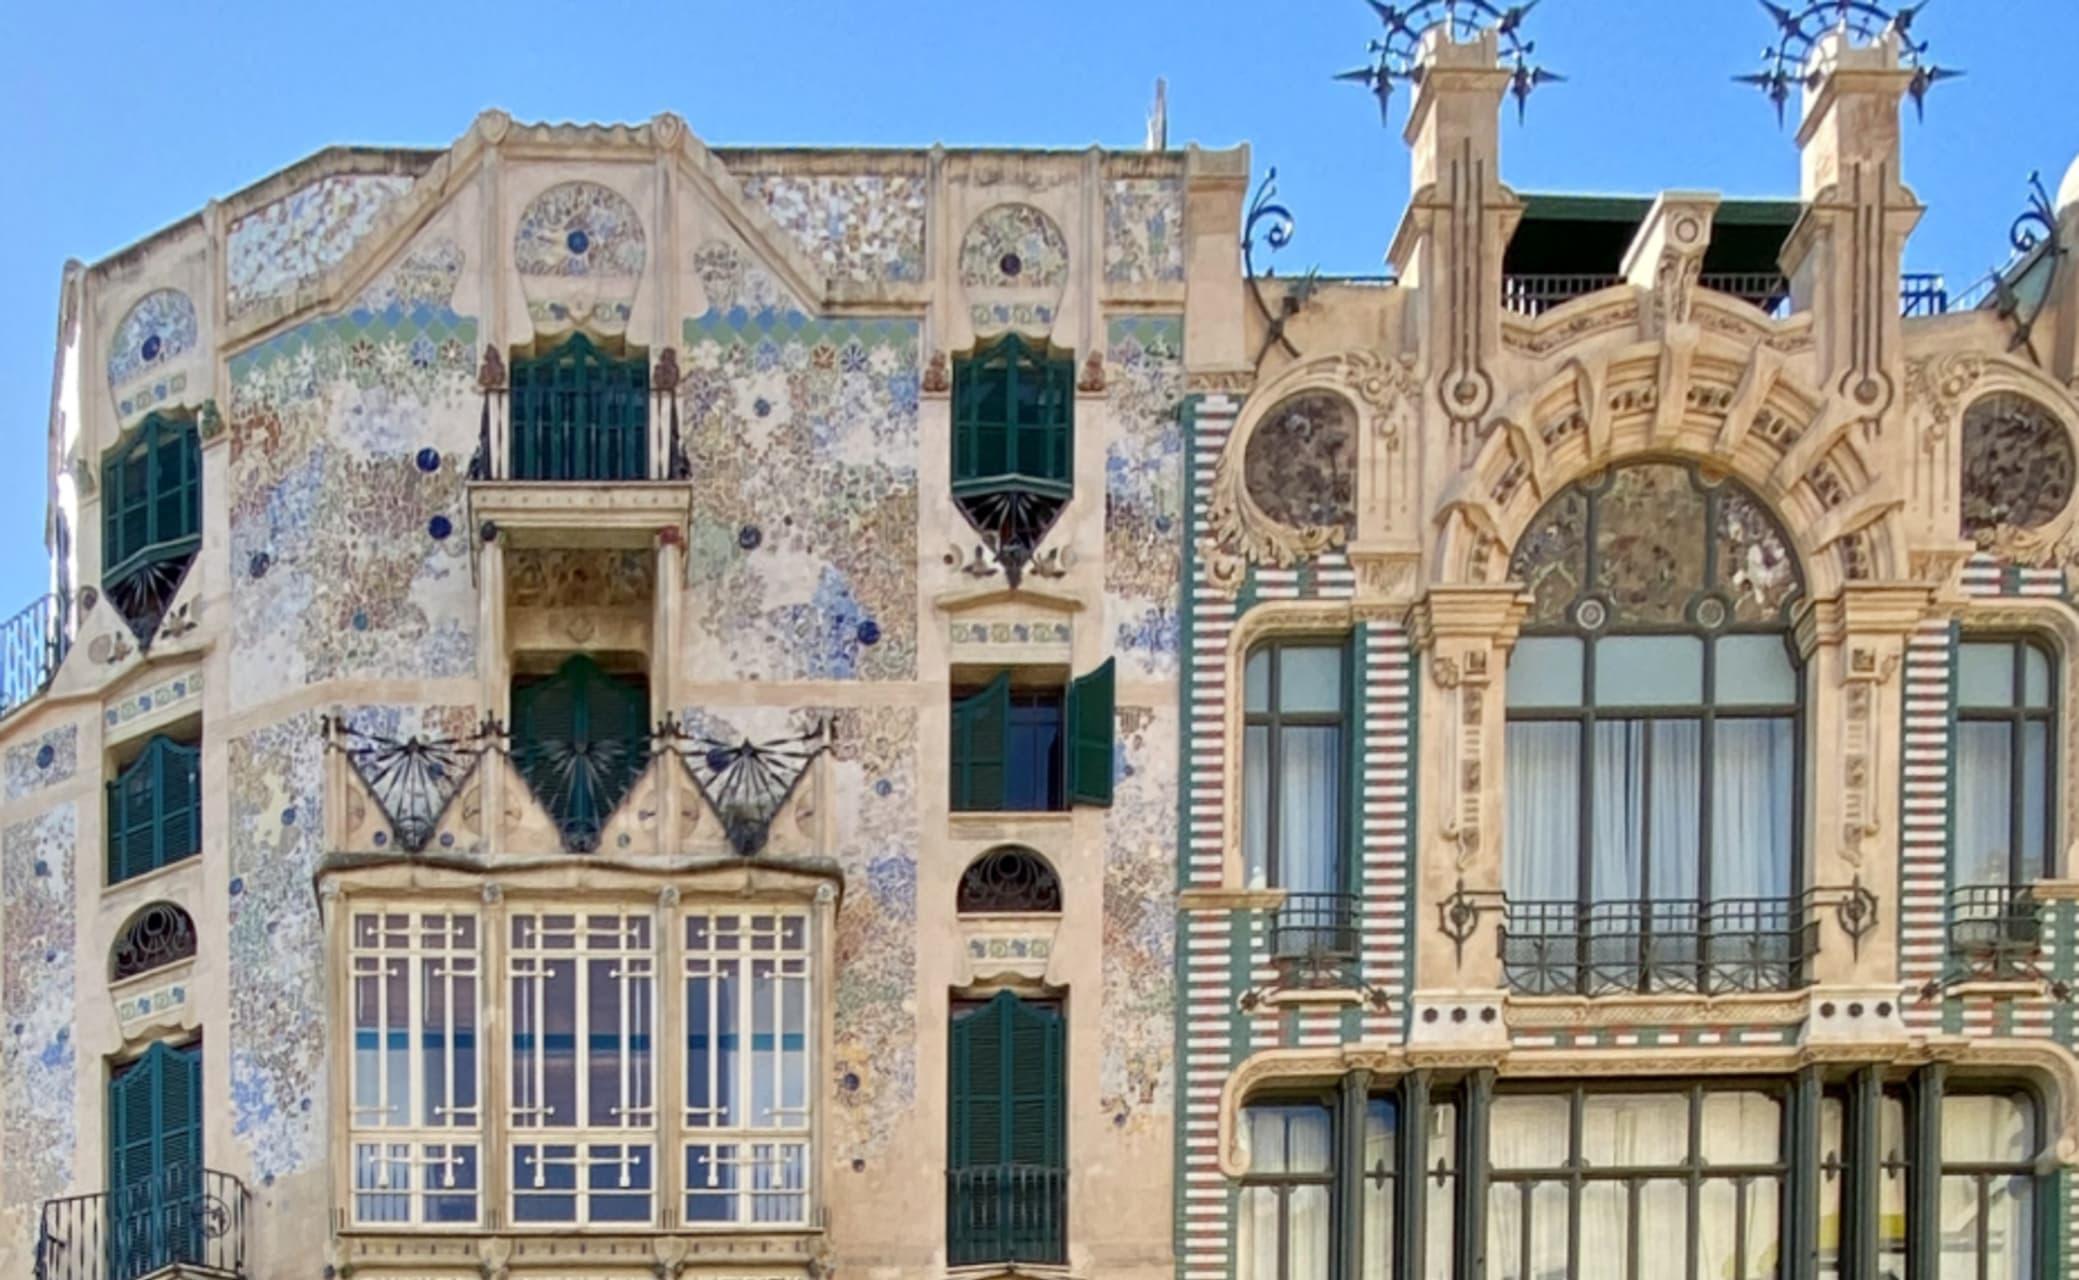 Mallorca - A different View of Palma